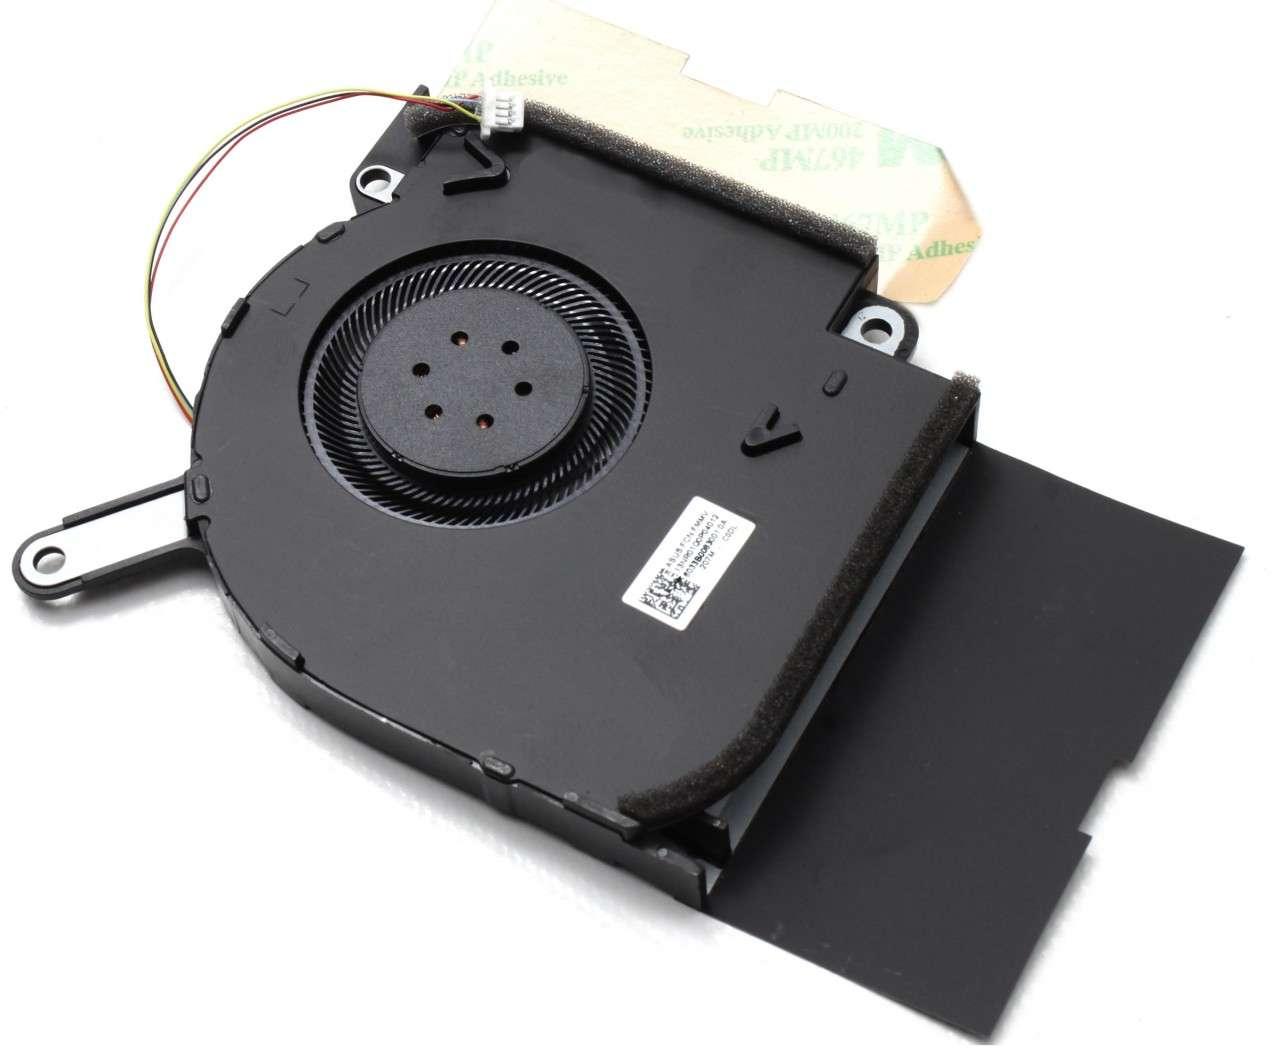 Cooler placa video laptop GPU Asus ROG Strix G731GU 12V imagine powerlaptop.ro 2021